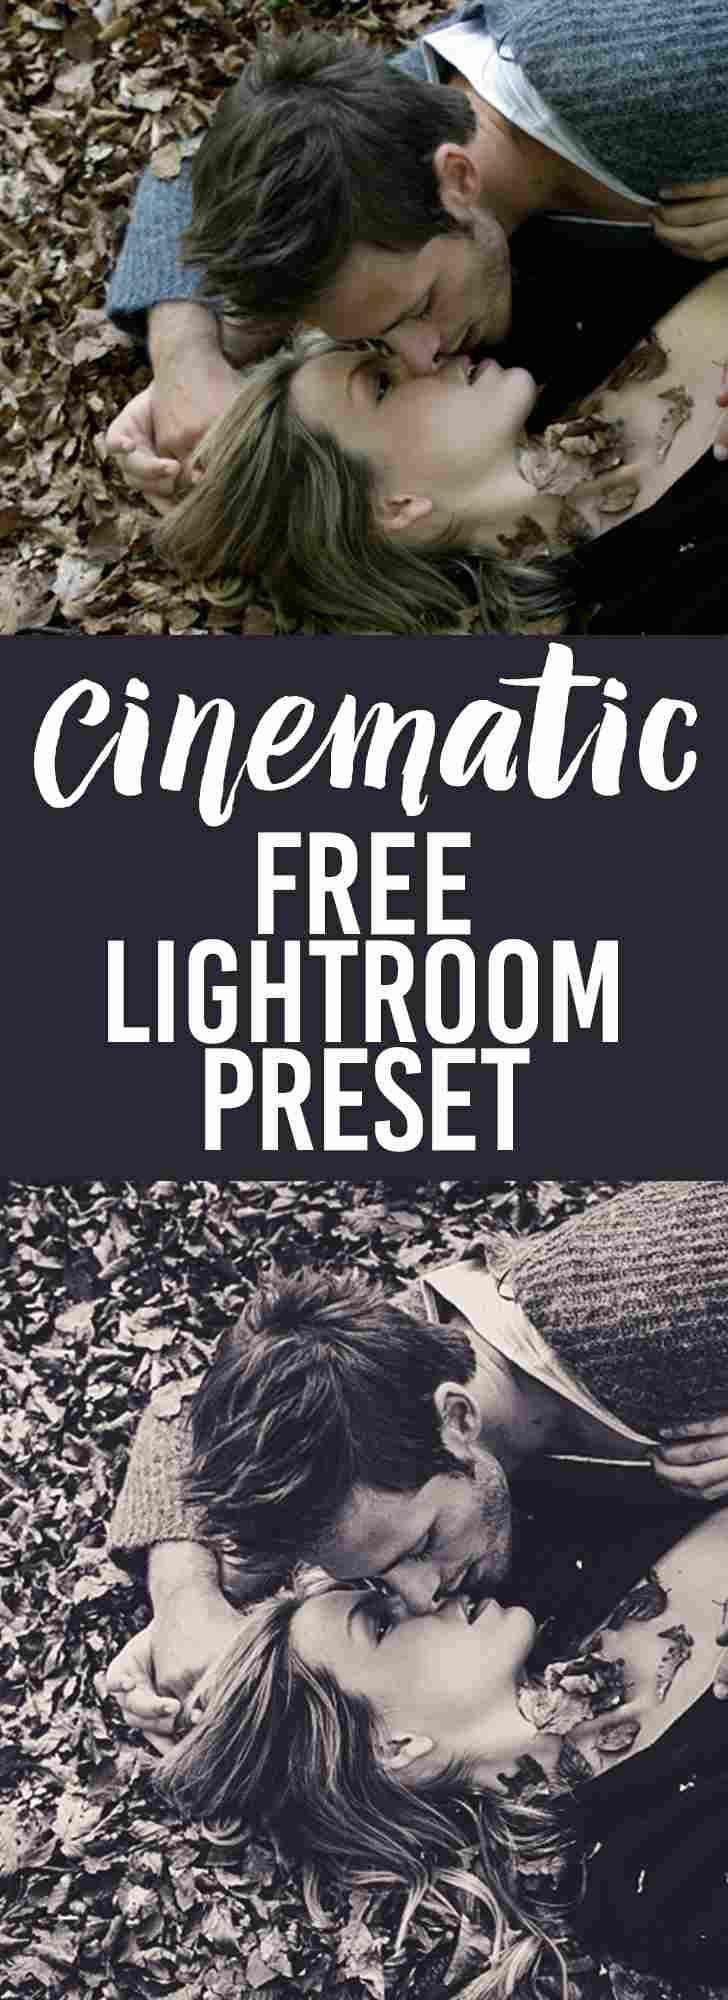 Free Lightroom Presets Cinematic